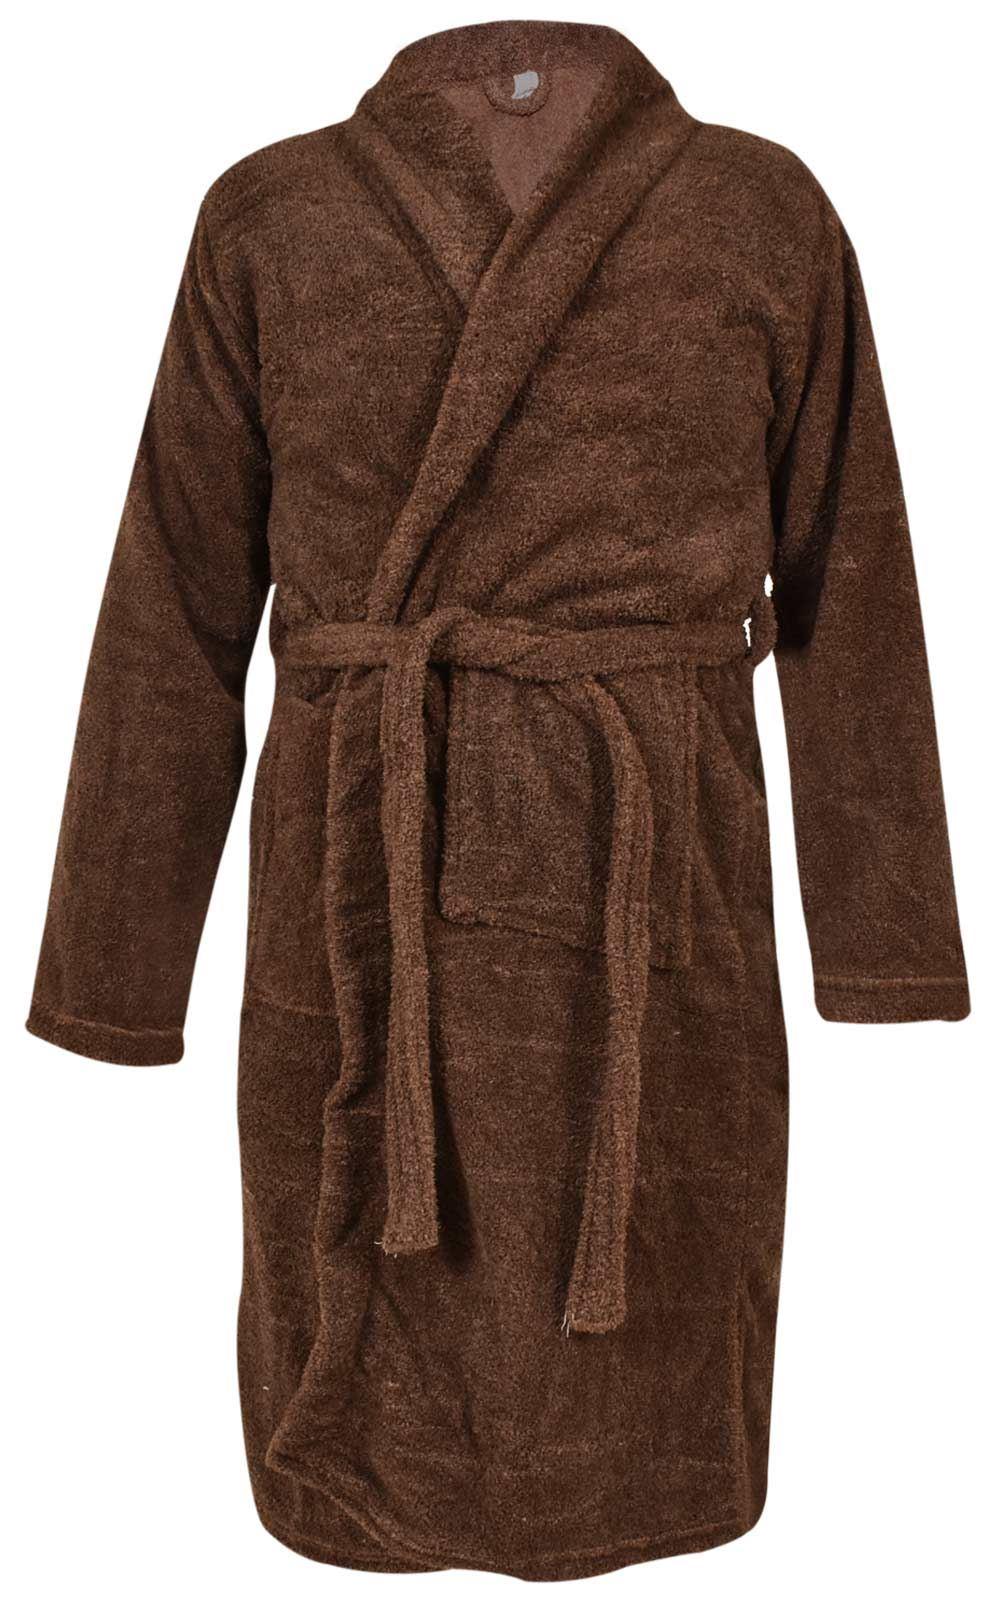 a1fb50a4ab Mens Bathrobe Polyester Fleece Pockets Plain Comfy Dressing Gown